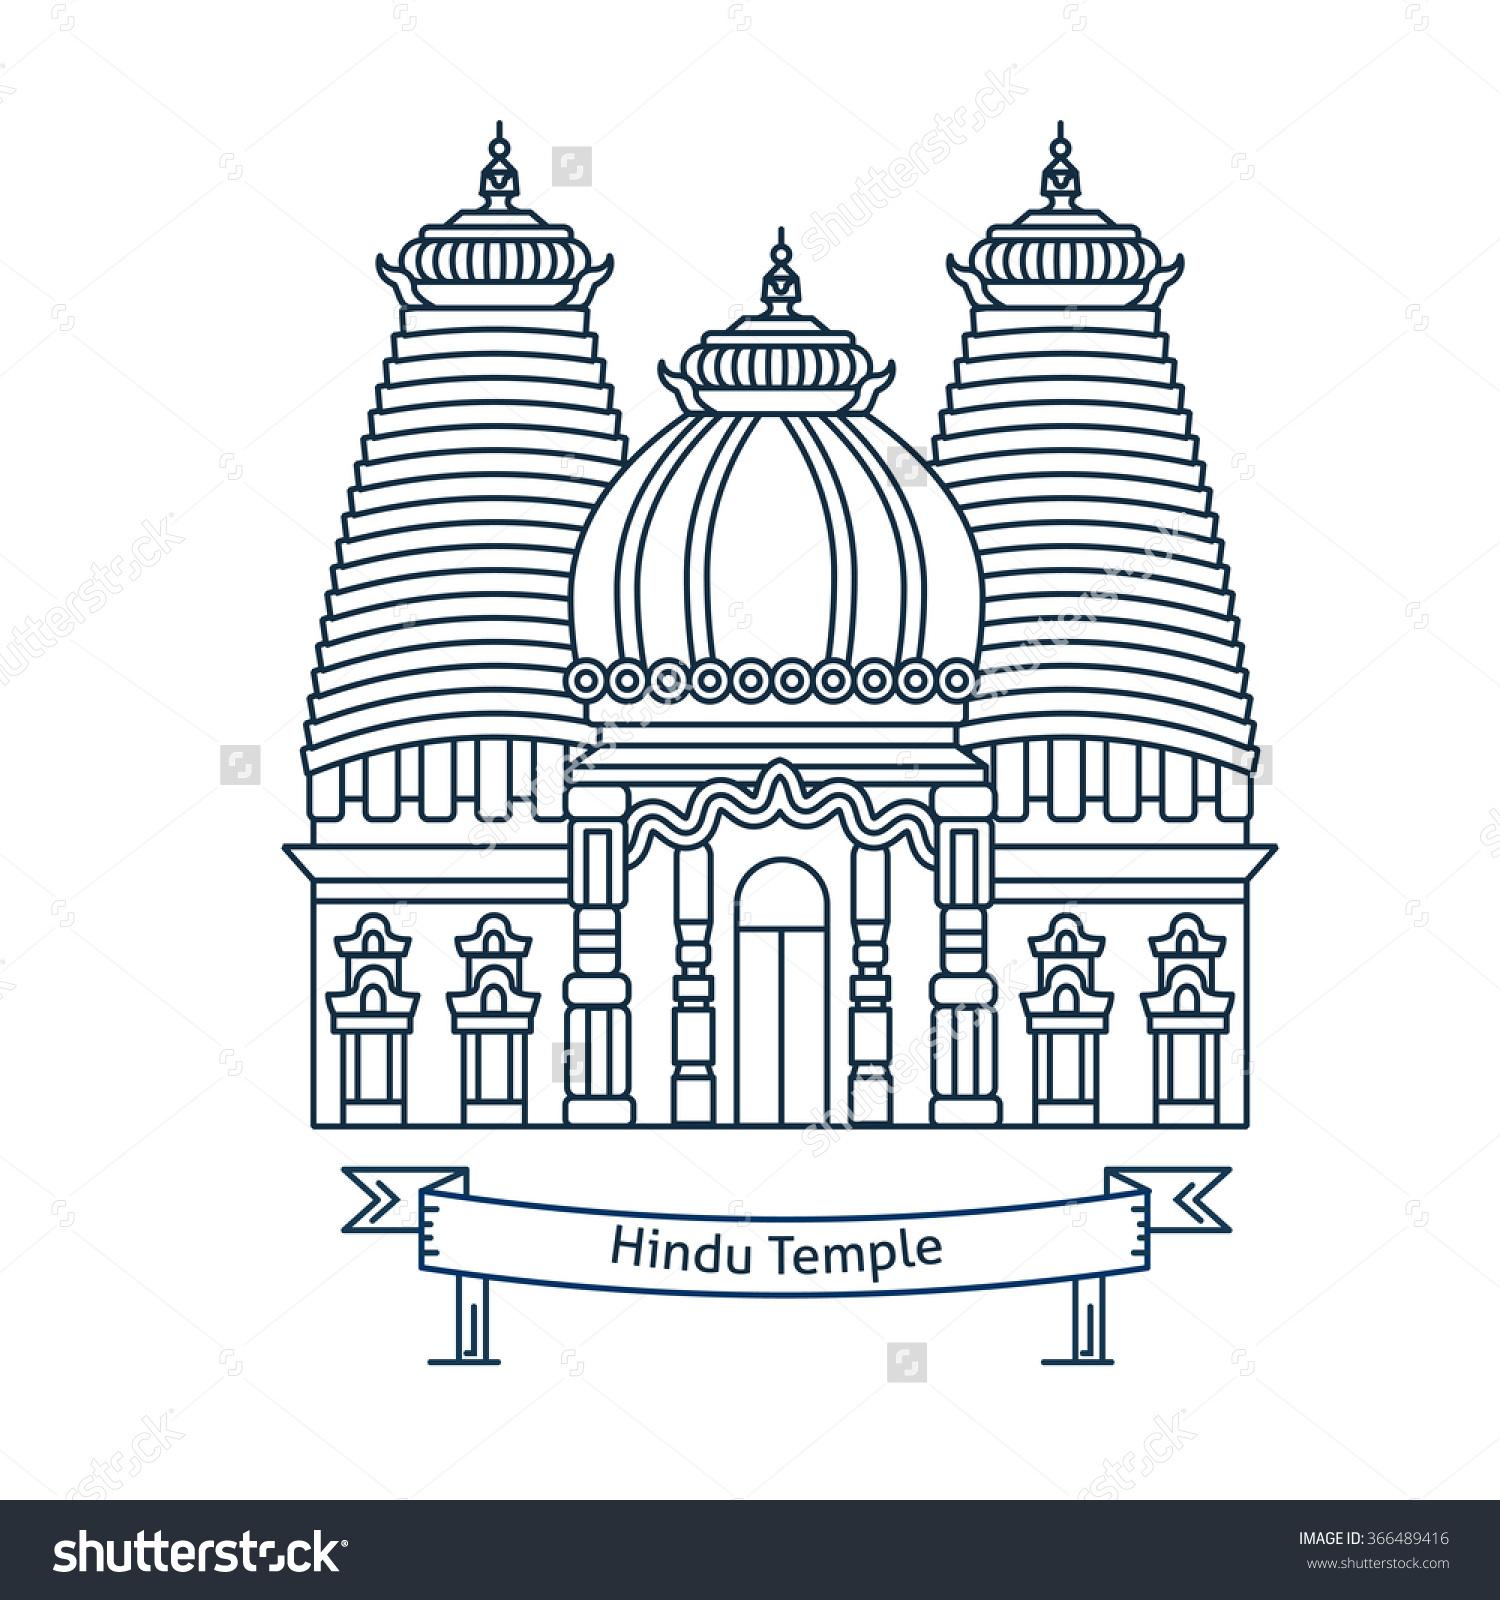 Hindu Temple Hinduism Symbol Indian Temple Stock Vector 366489416.